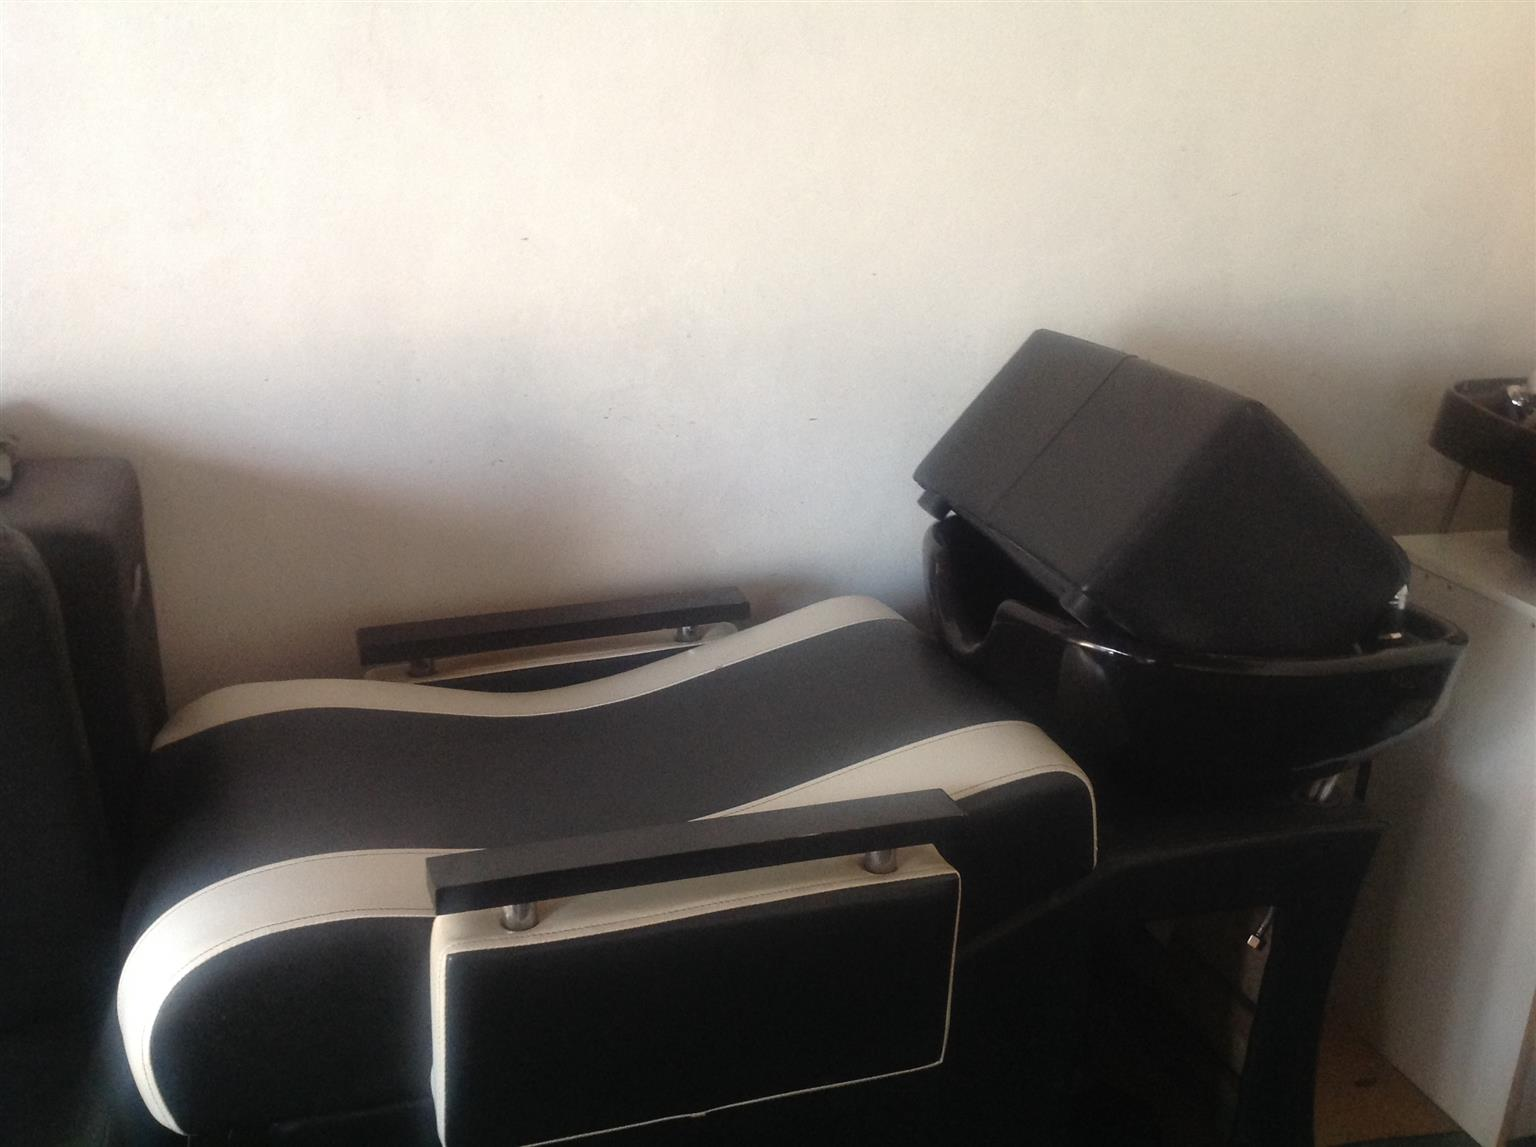 Salon wash basins for sale junk mail for Salon basins for sale